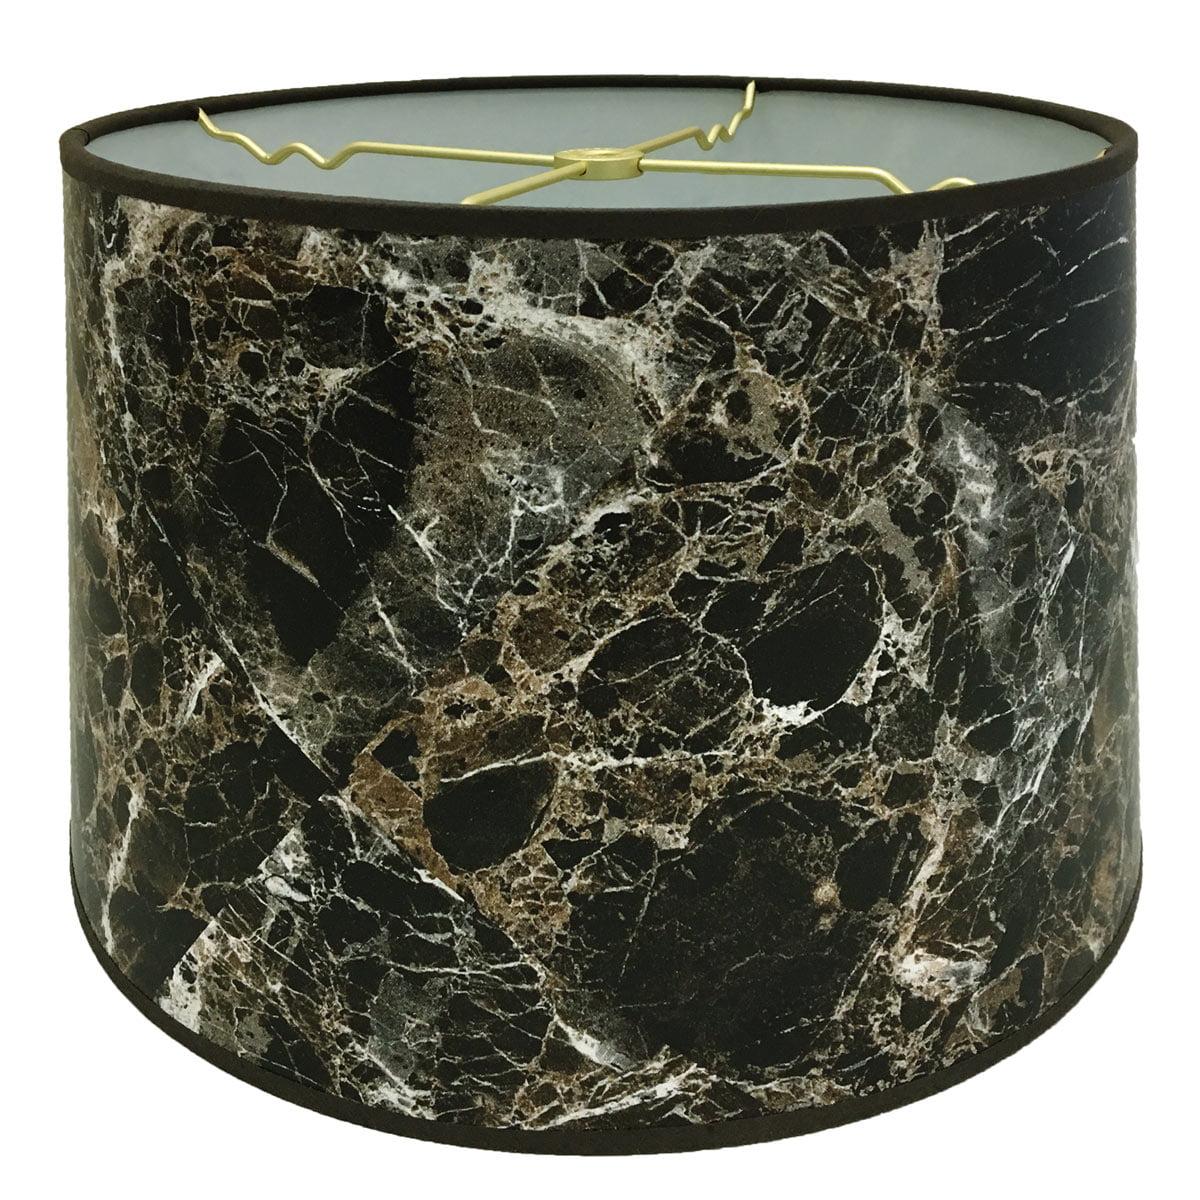 Royal Designs Dark Brown Marble Texture Hardback Lamp Shade, 13 x 14 x 9.5